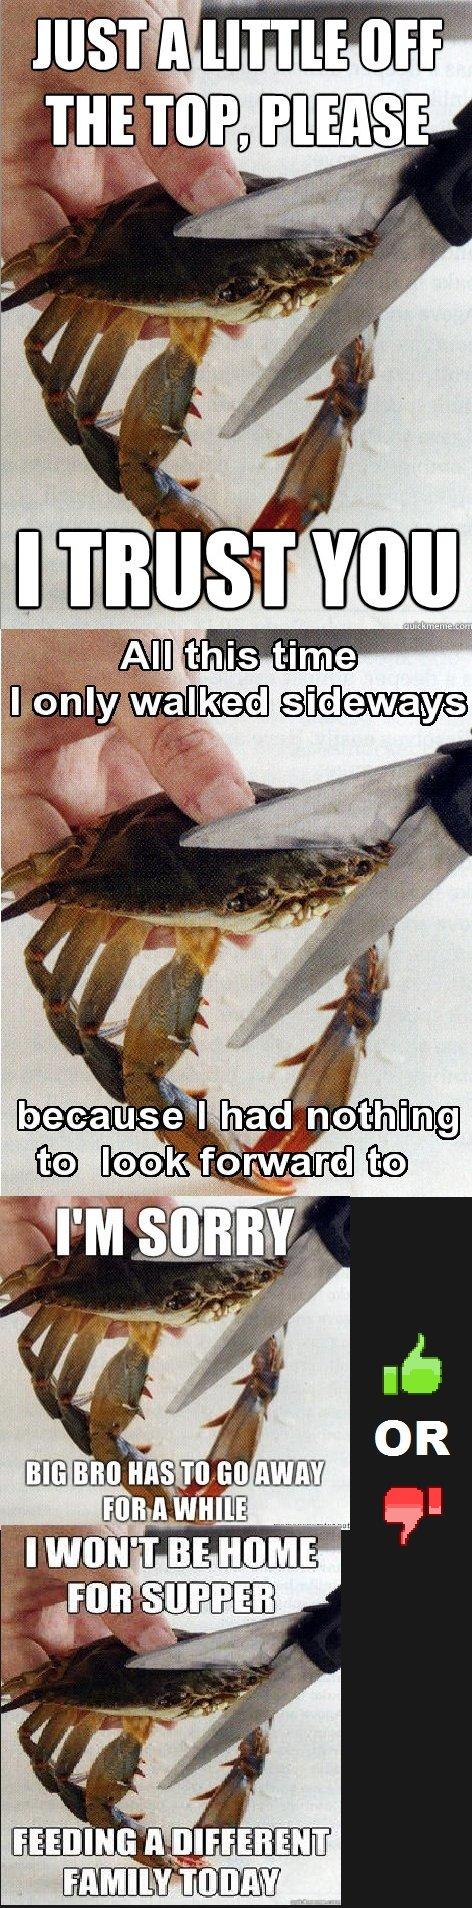 This Kills The Crab. Sad Crab or This Kills The Crab complication. sad crab this Kills the